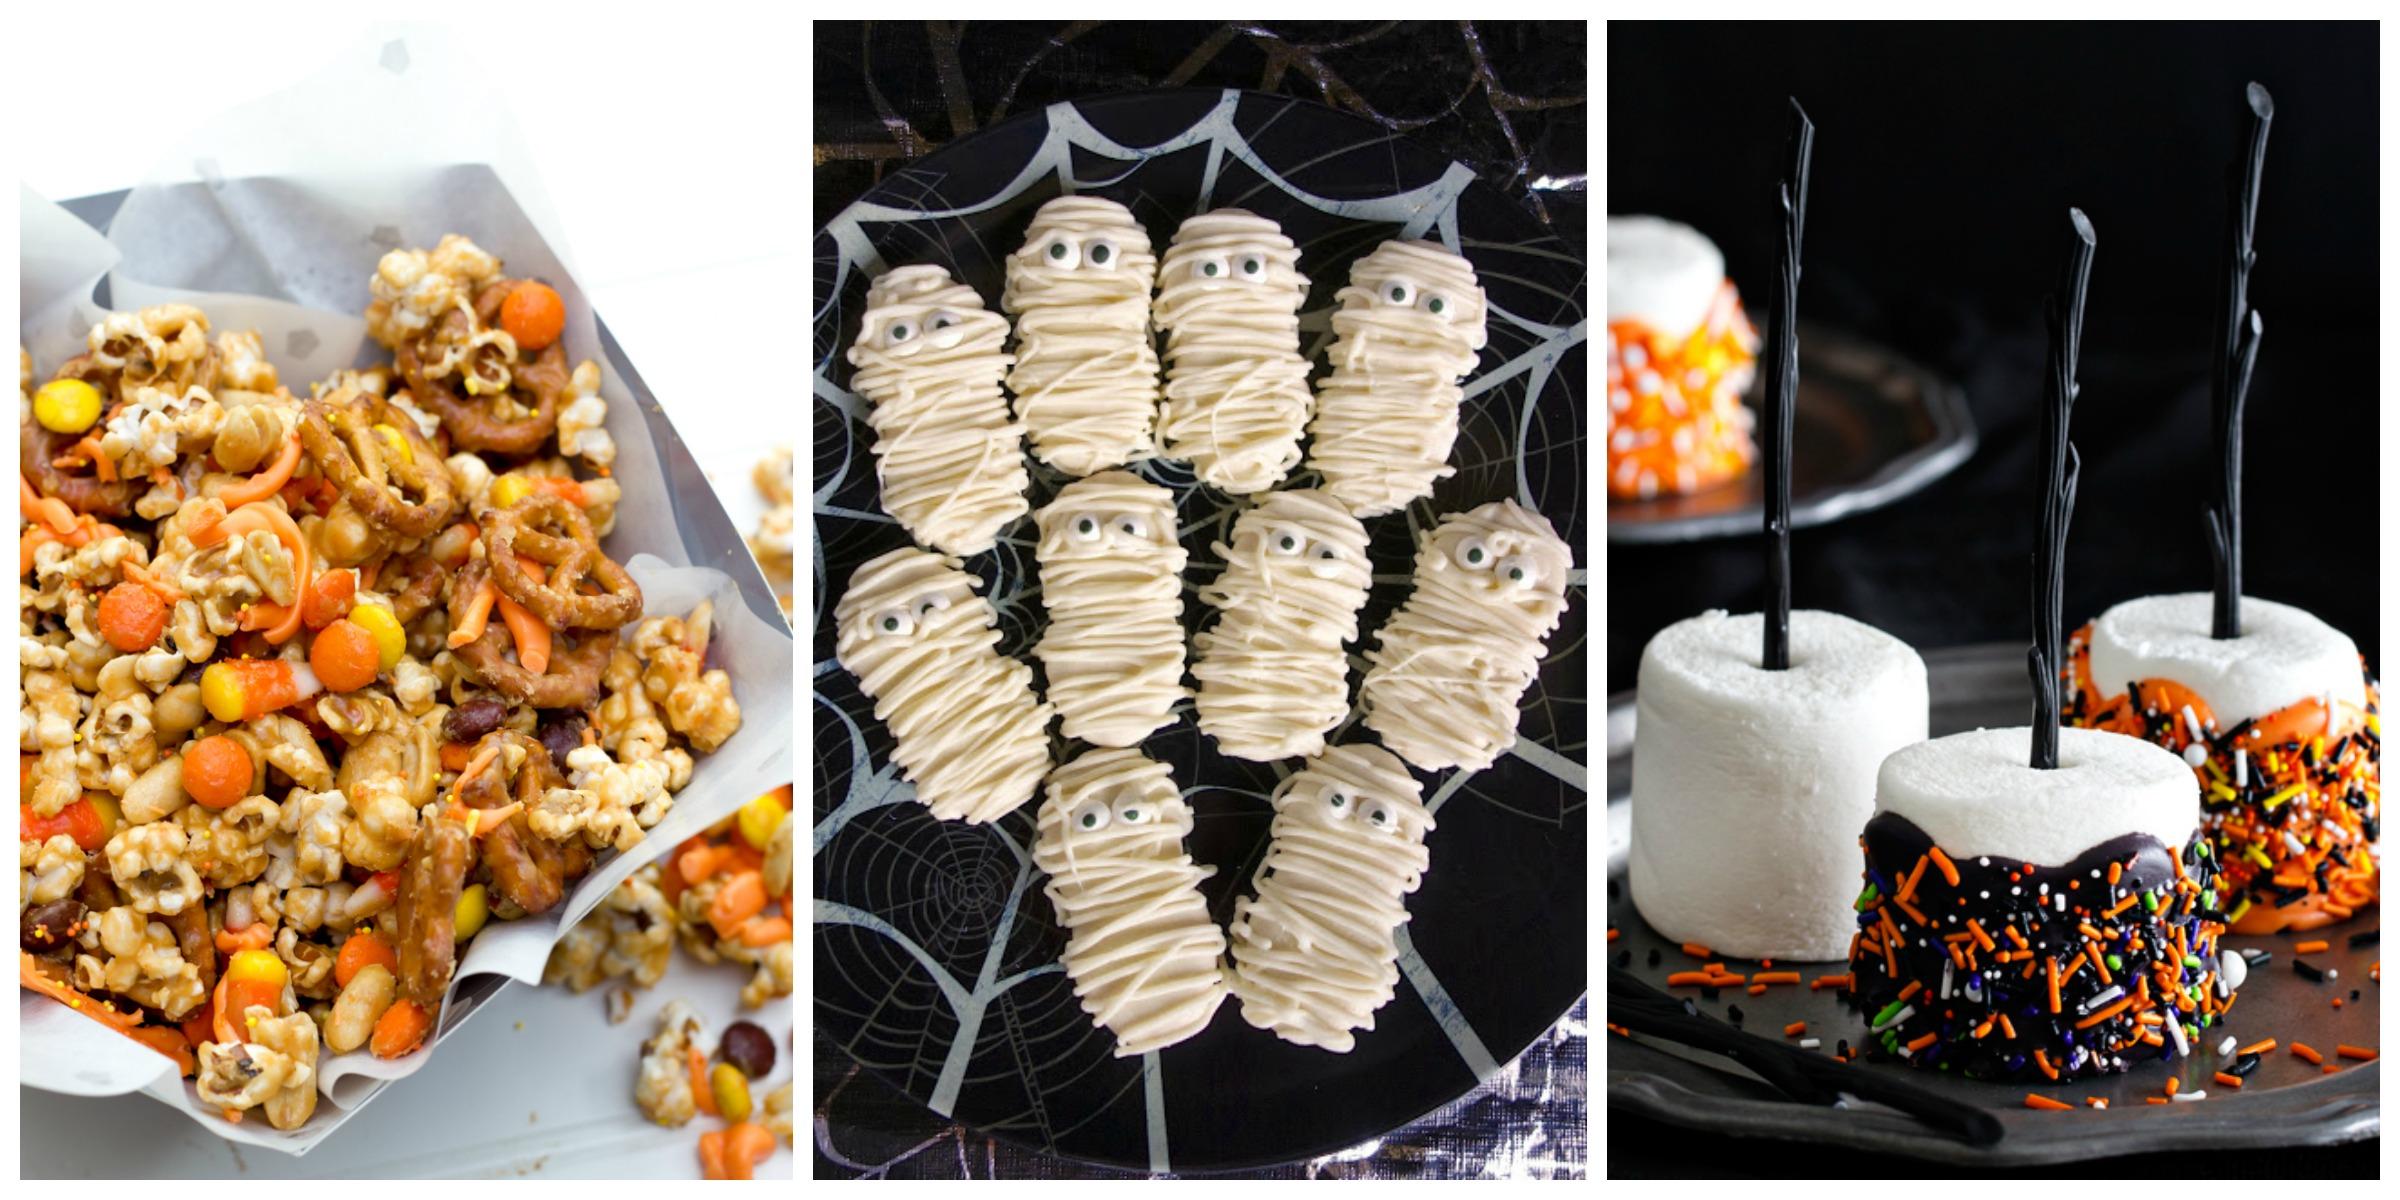 22 easy halloween party food ideas cute recipes for for Children s halloween party food ideas